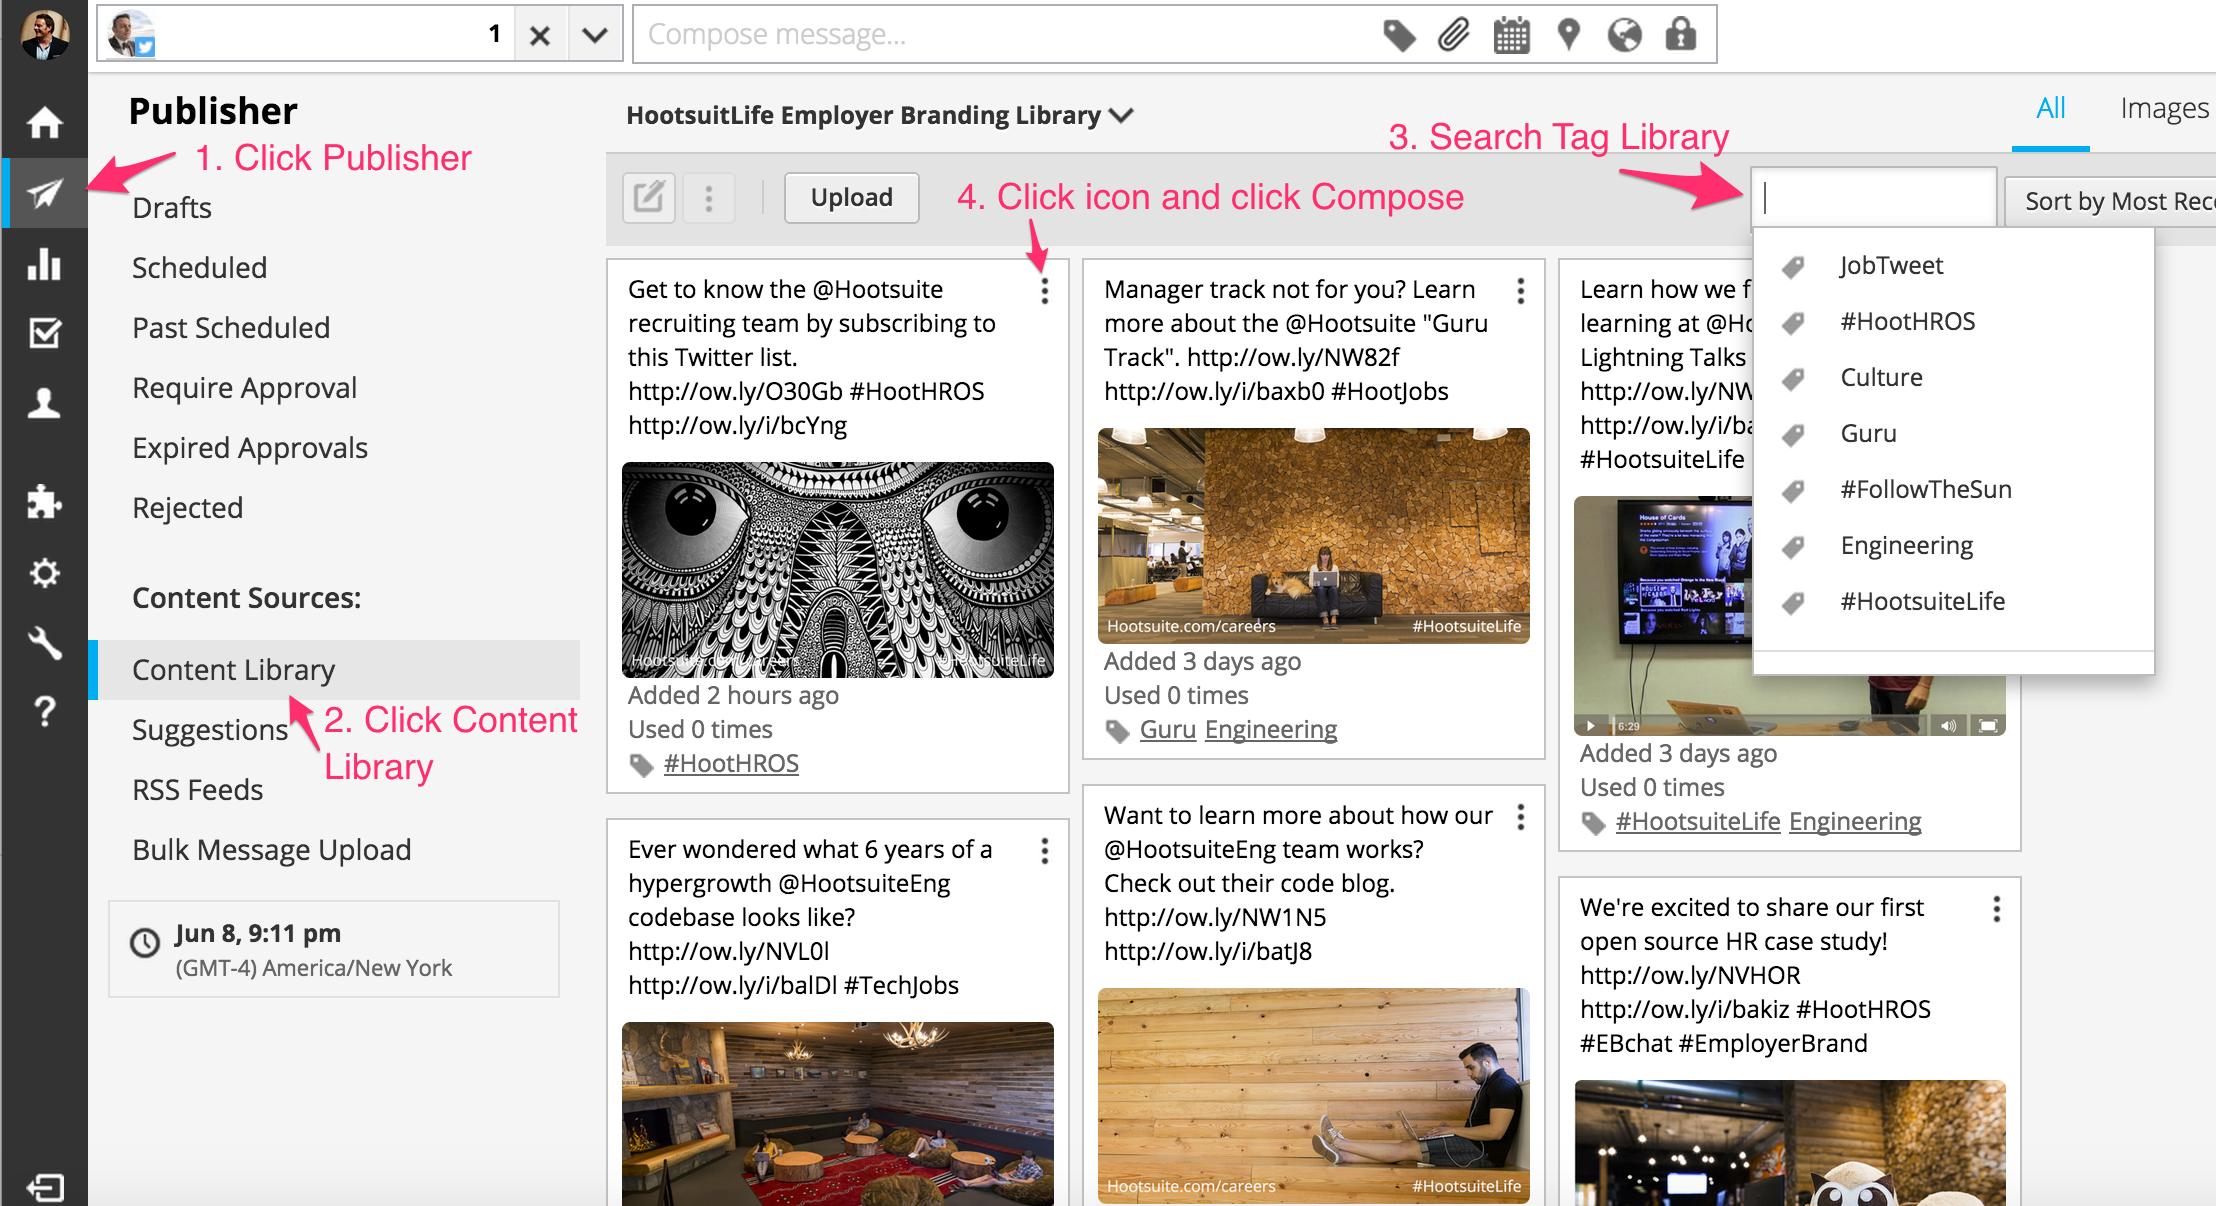 Hootsuite Employer Branding Asset Library